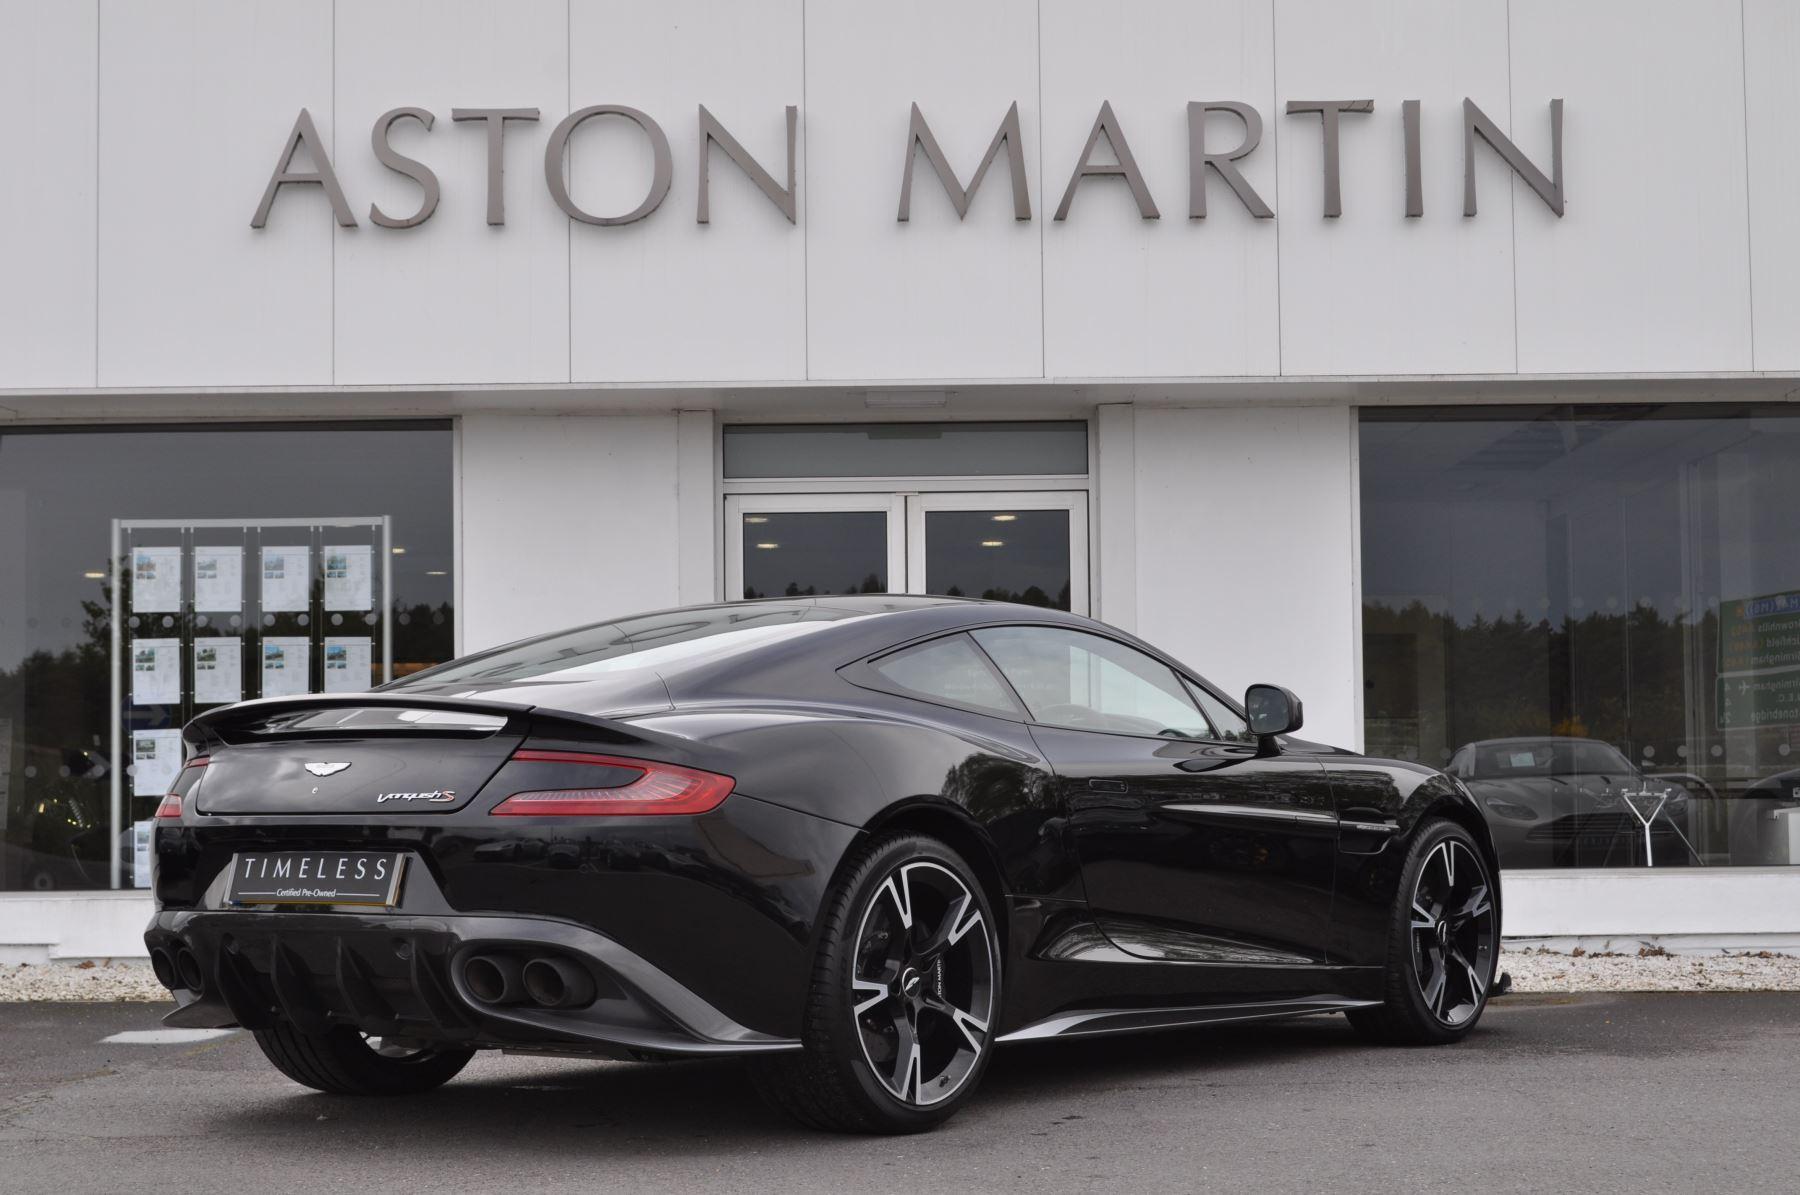 Aston Martin Vanquish S V12 [595] S 2+2 2dr Touchtronic image 5